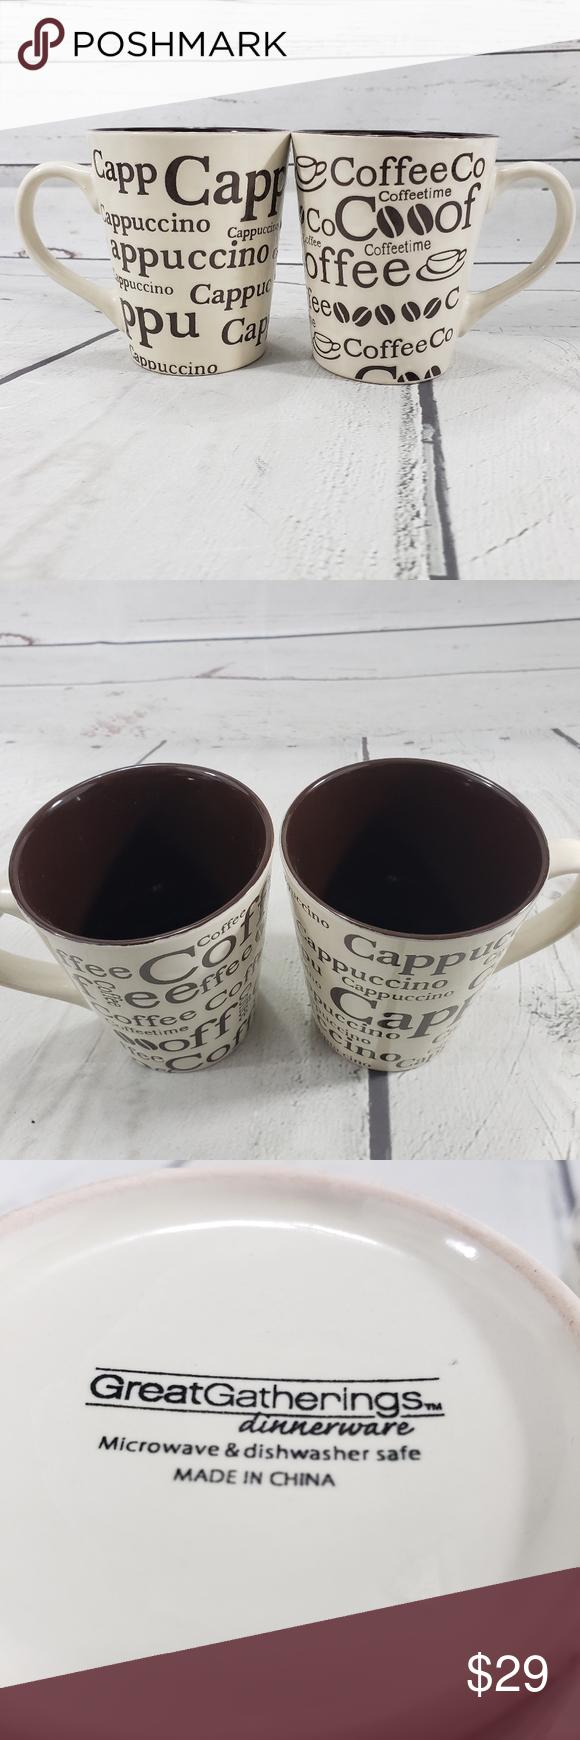 Great Gatherings Dinnerware Mugs Coffee Cappuccino In 2020 Dinnerware Cappuccino Mugs